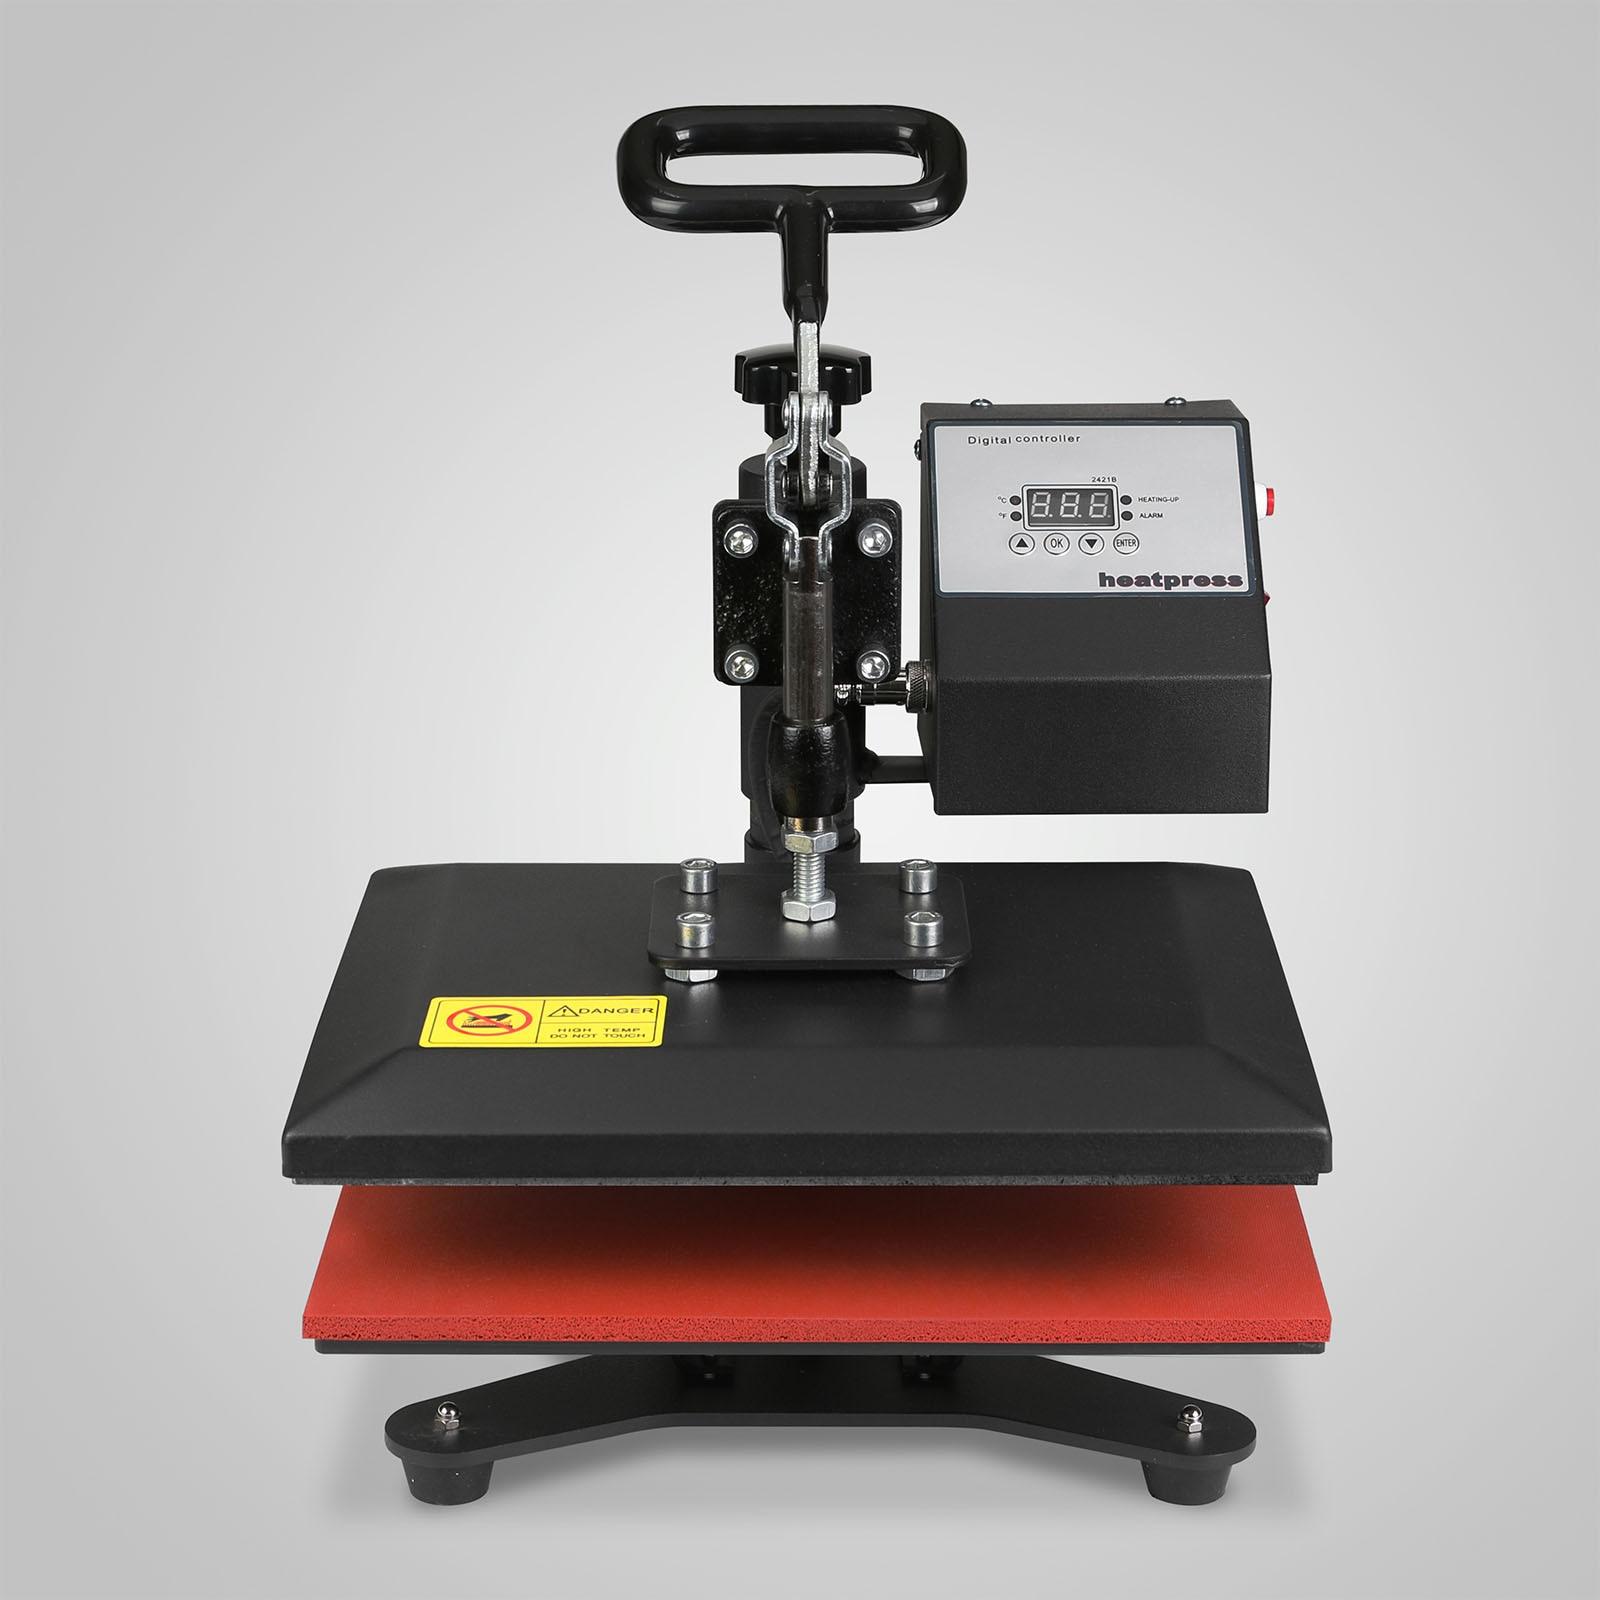 Digital Transfer Swing Away Heat Press Machine 12